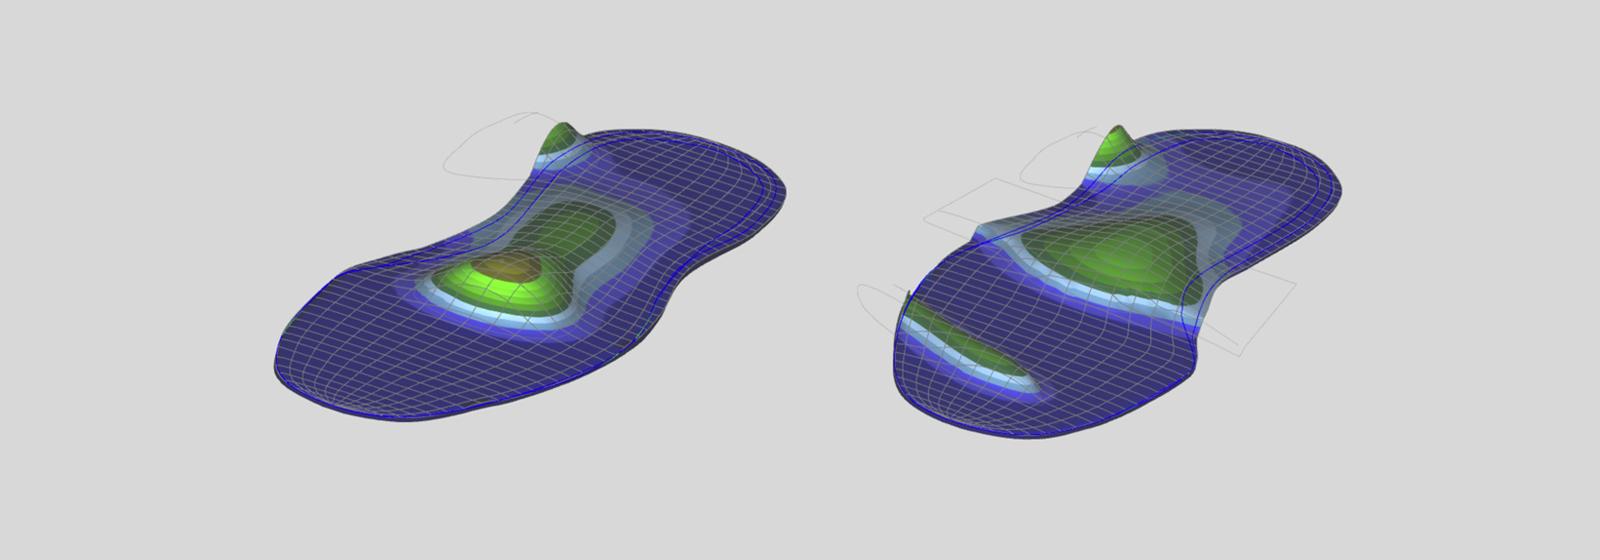 Semelles CAD CAM Podologie Reiland